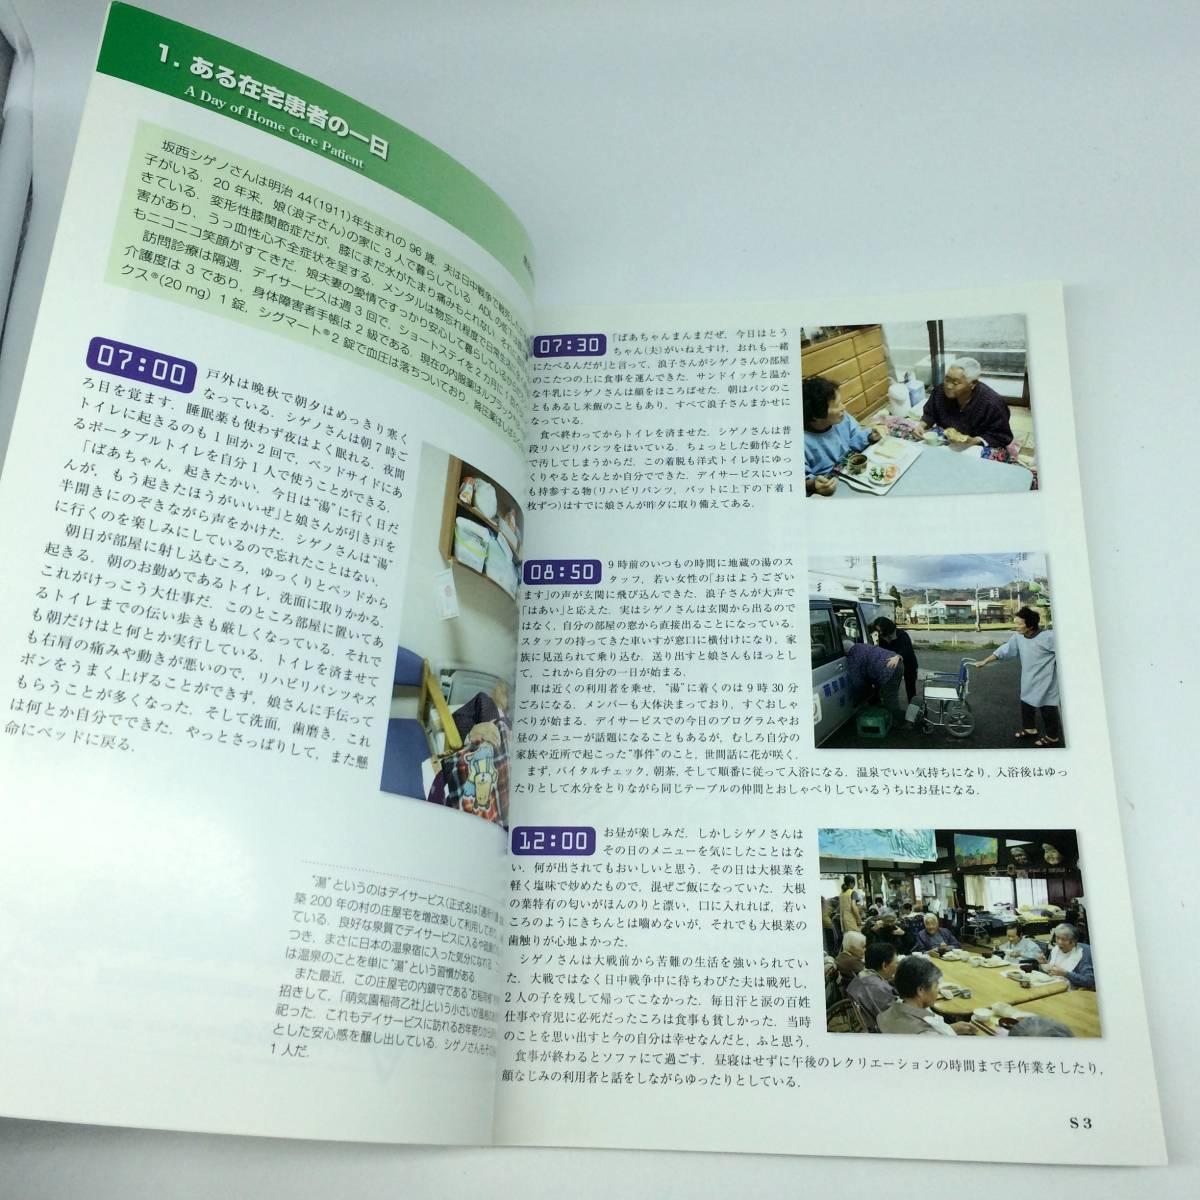 在宅医療 午後から地域へ 生涯教育シリーズ 78 日本医師会雑誌 第139巻 特別号_画像3